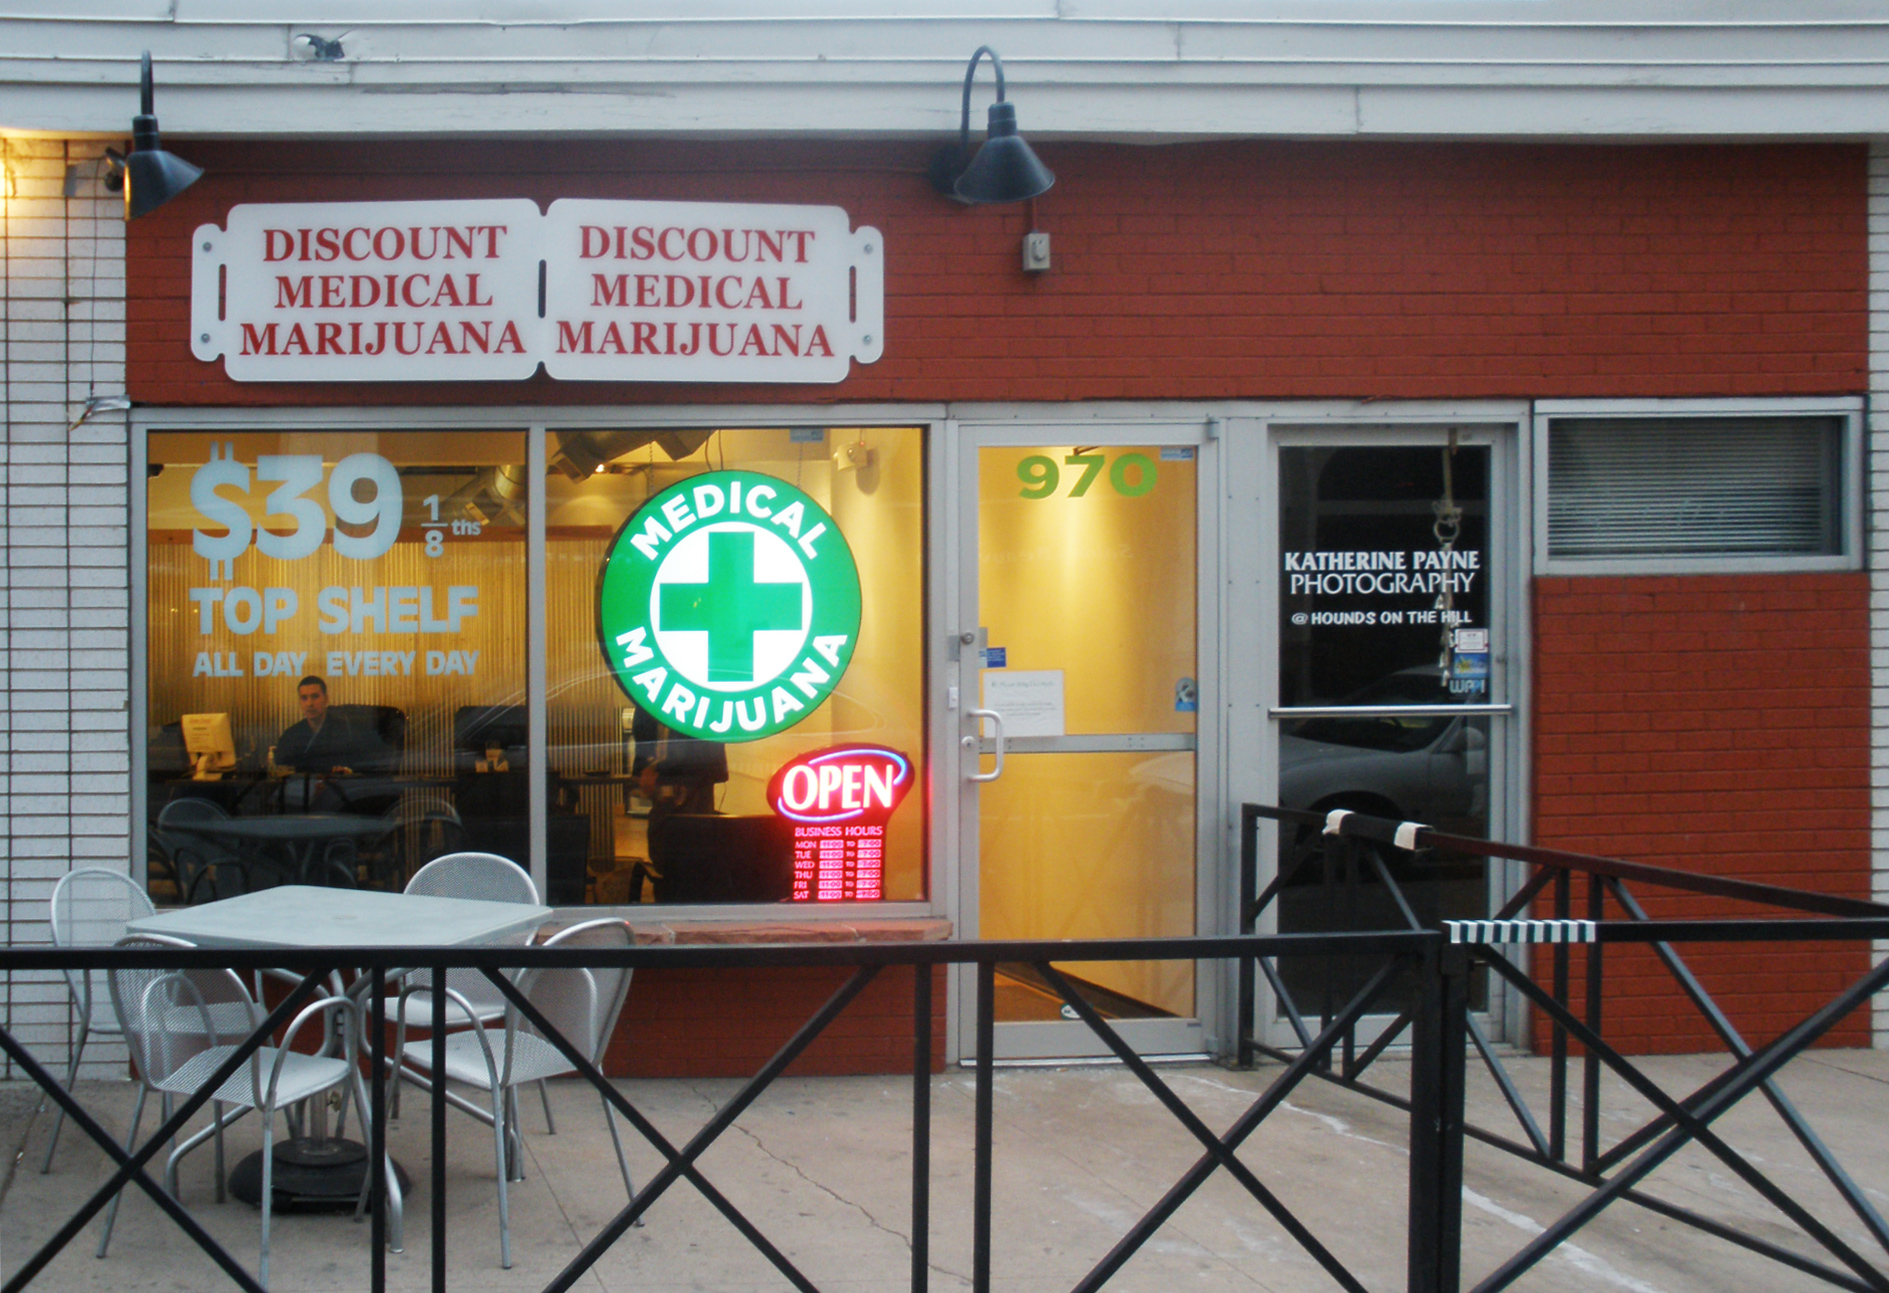 File:Discount Medical Marijuana - 1.jpg - Wikimedia Commons